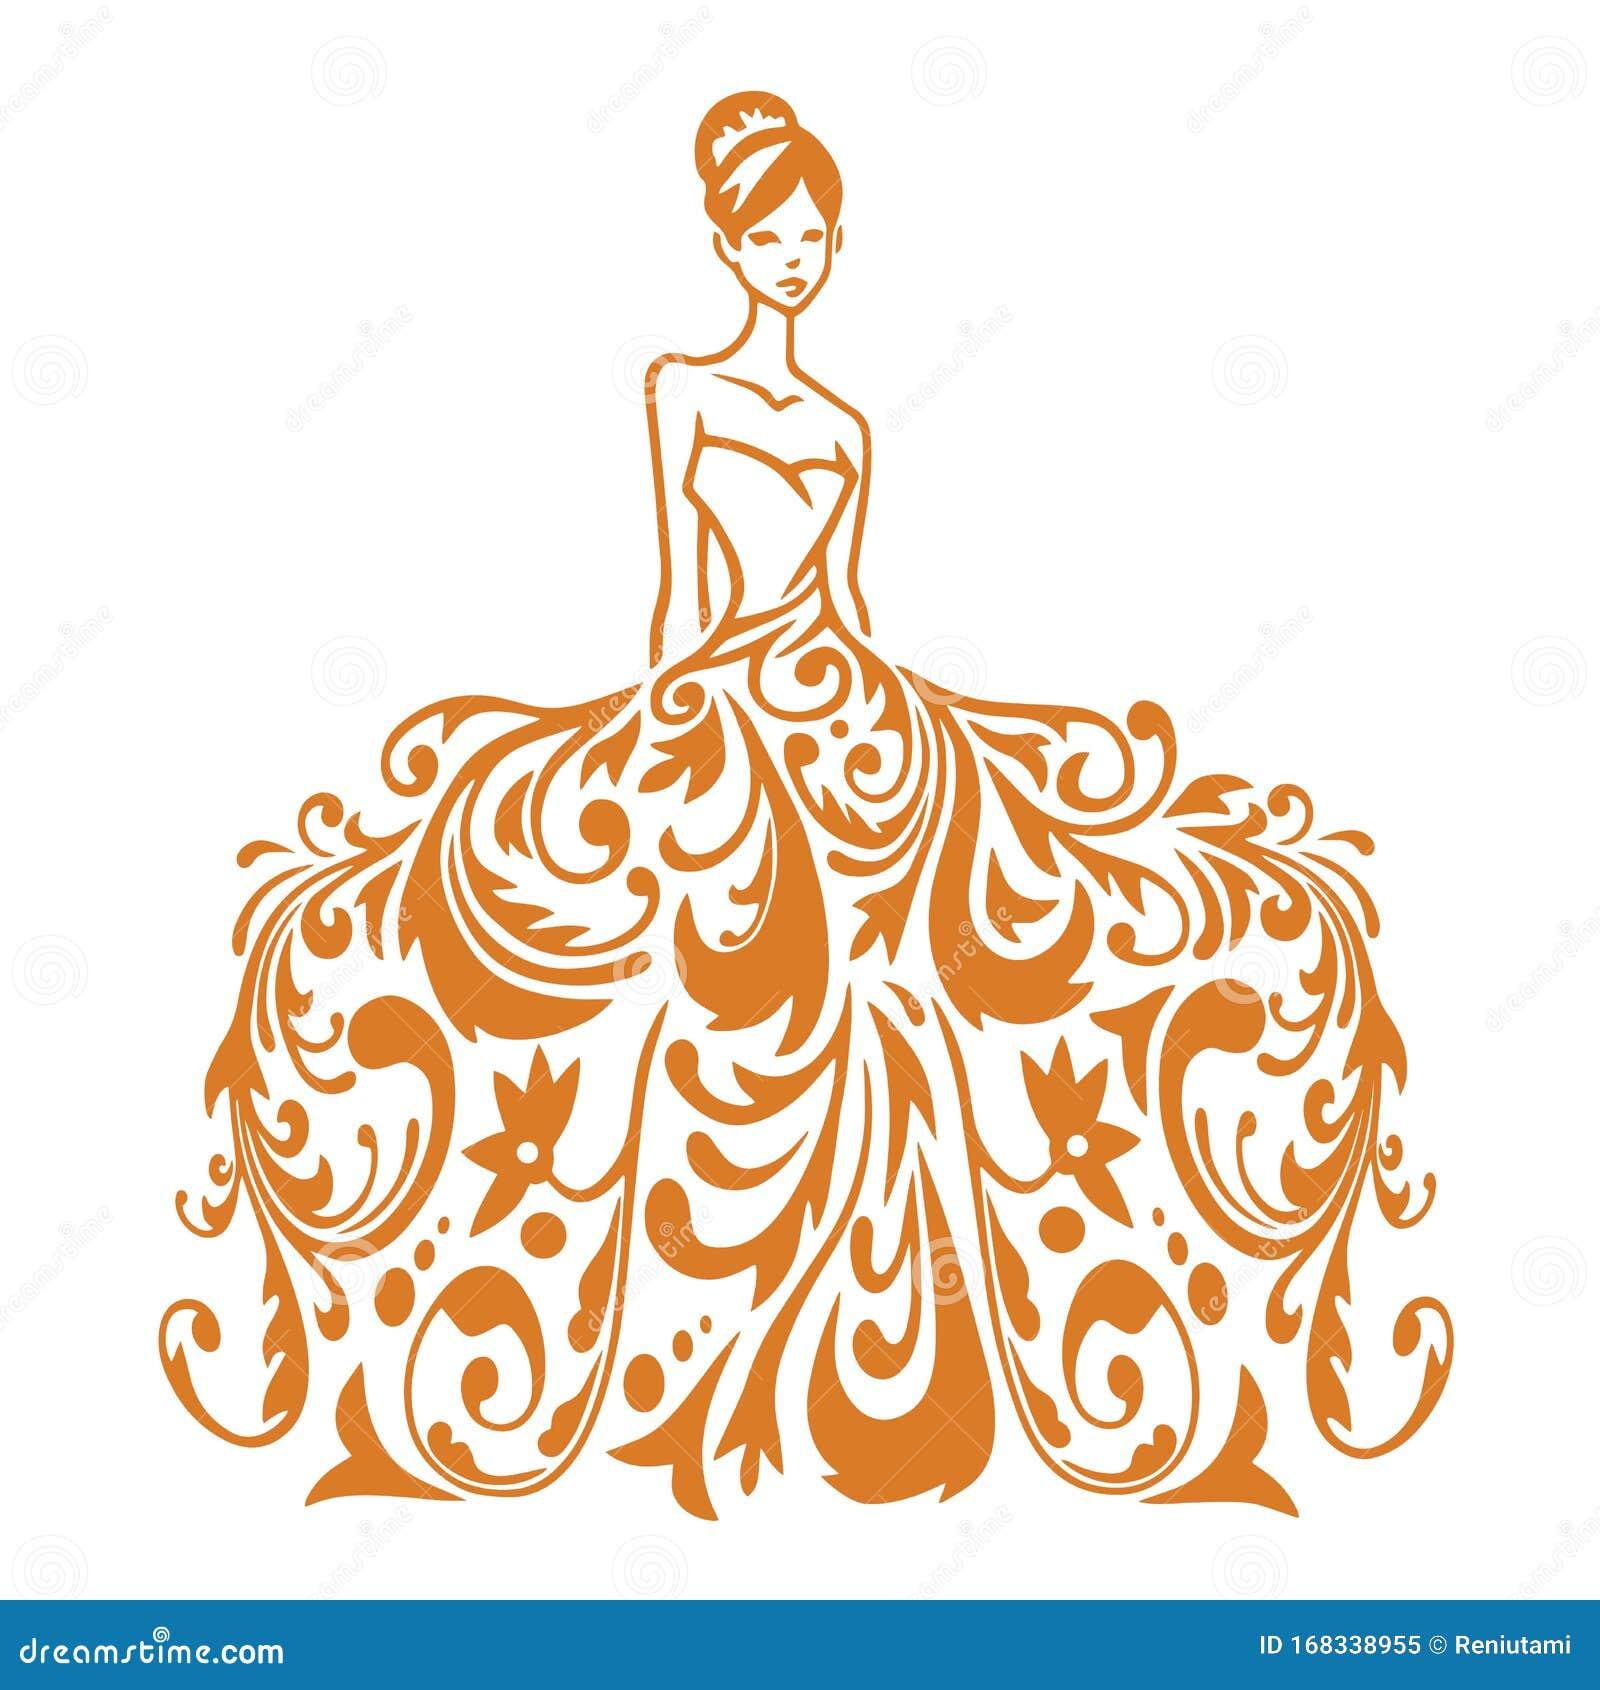 Beauty Bridal Wear Boutique Logo Wedding Gown Dress Fashion Logo Design Vector Illustration Stock Vector Illustration Of Design Bridal 168338955